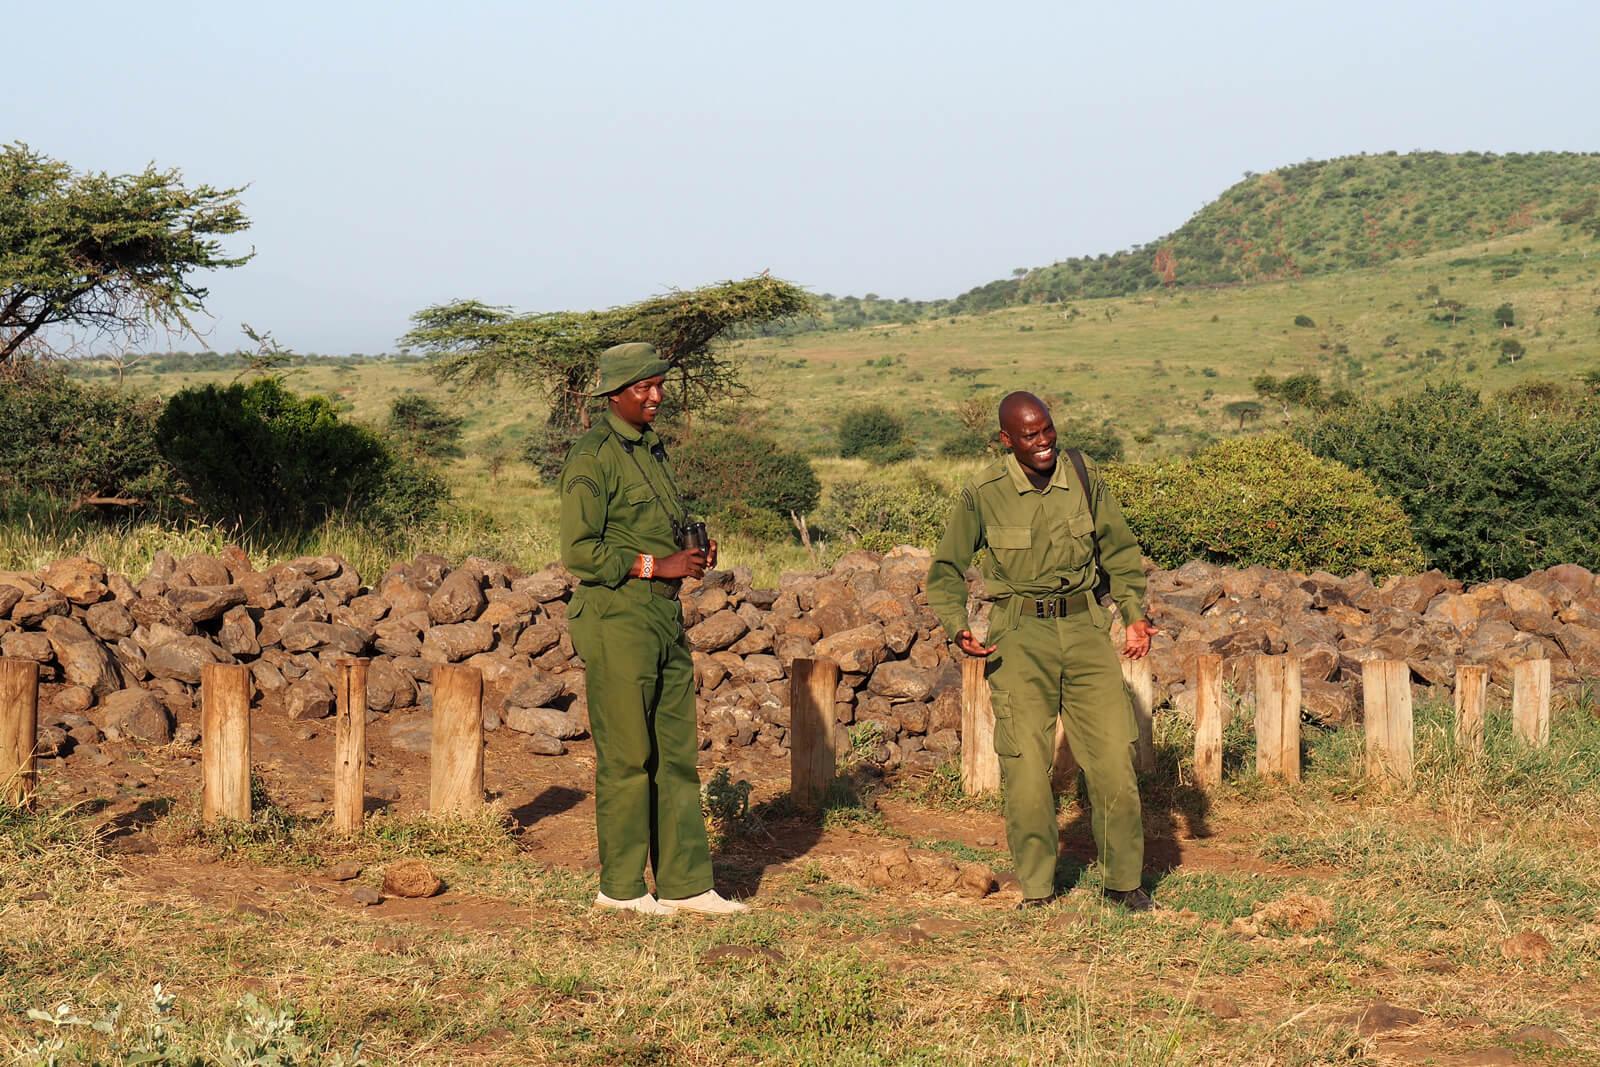 Lewa Wildlife Conservancy - Rhino Gate